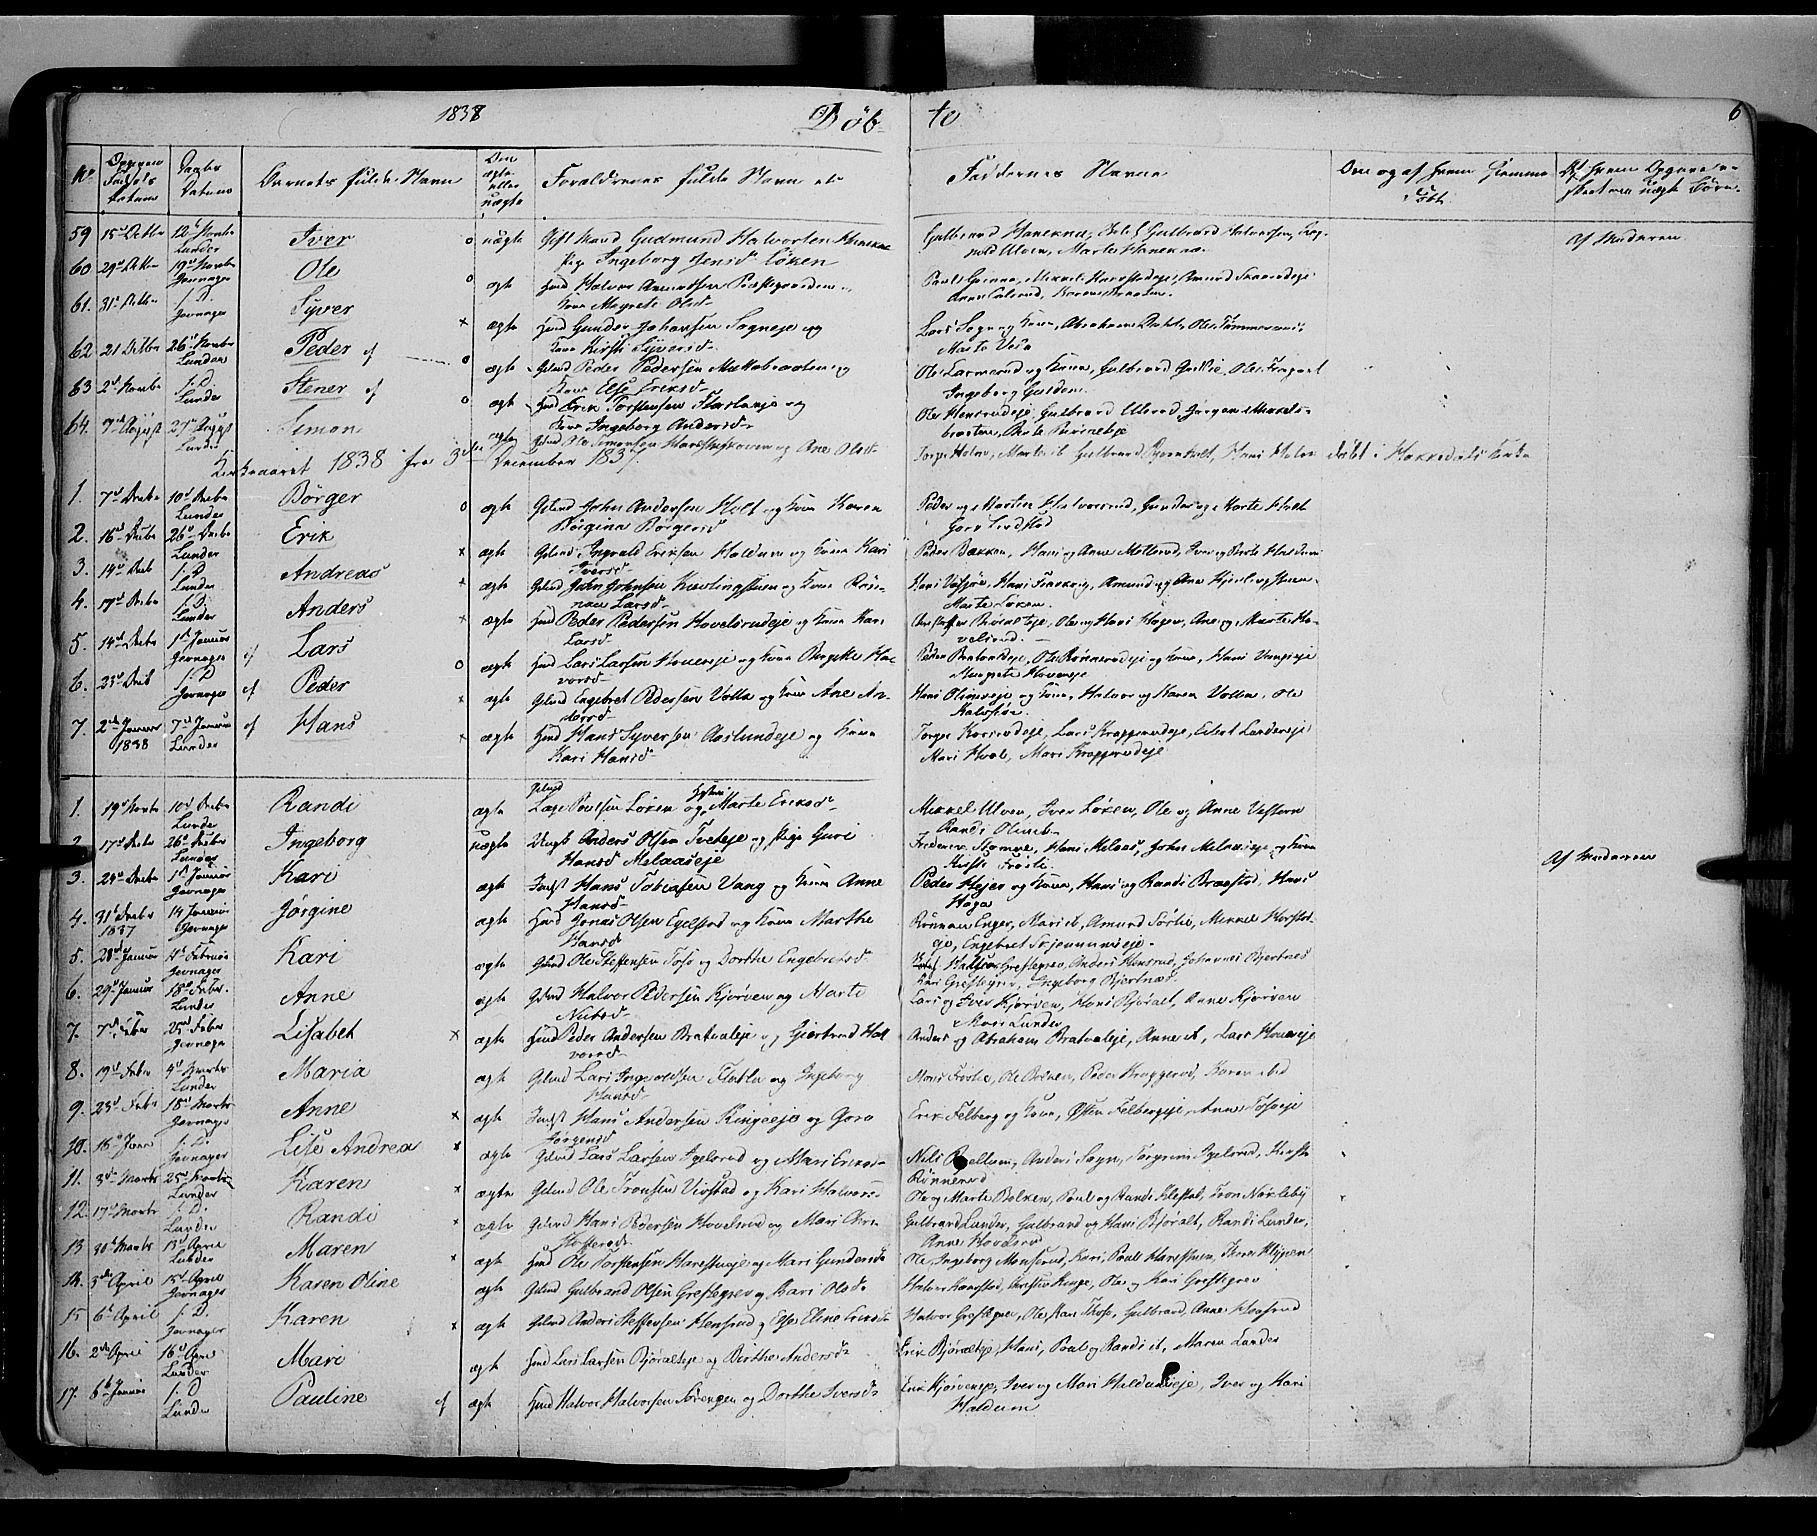 SAH, Jevnaker prestekontor, Ministerialbok nr. 6, 1837-1857, s. 6